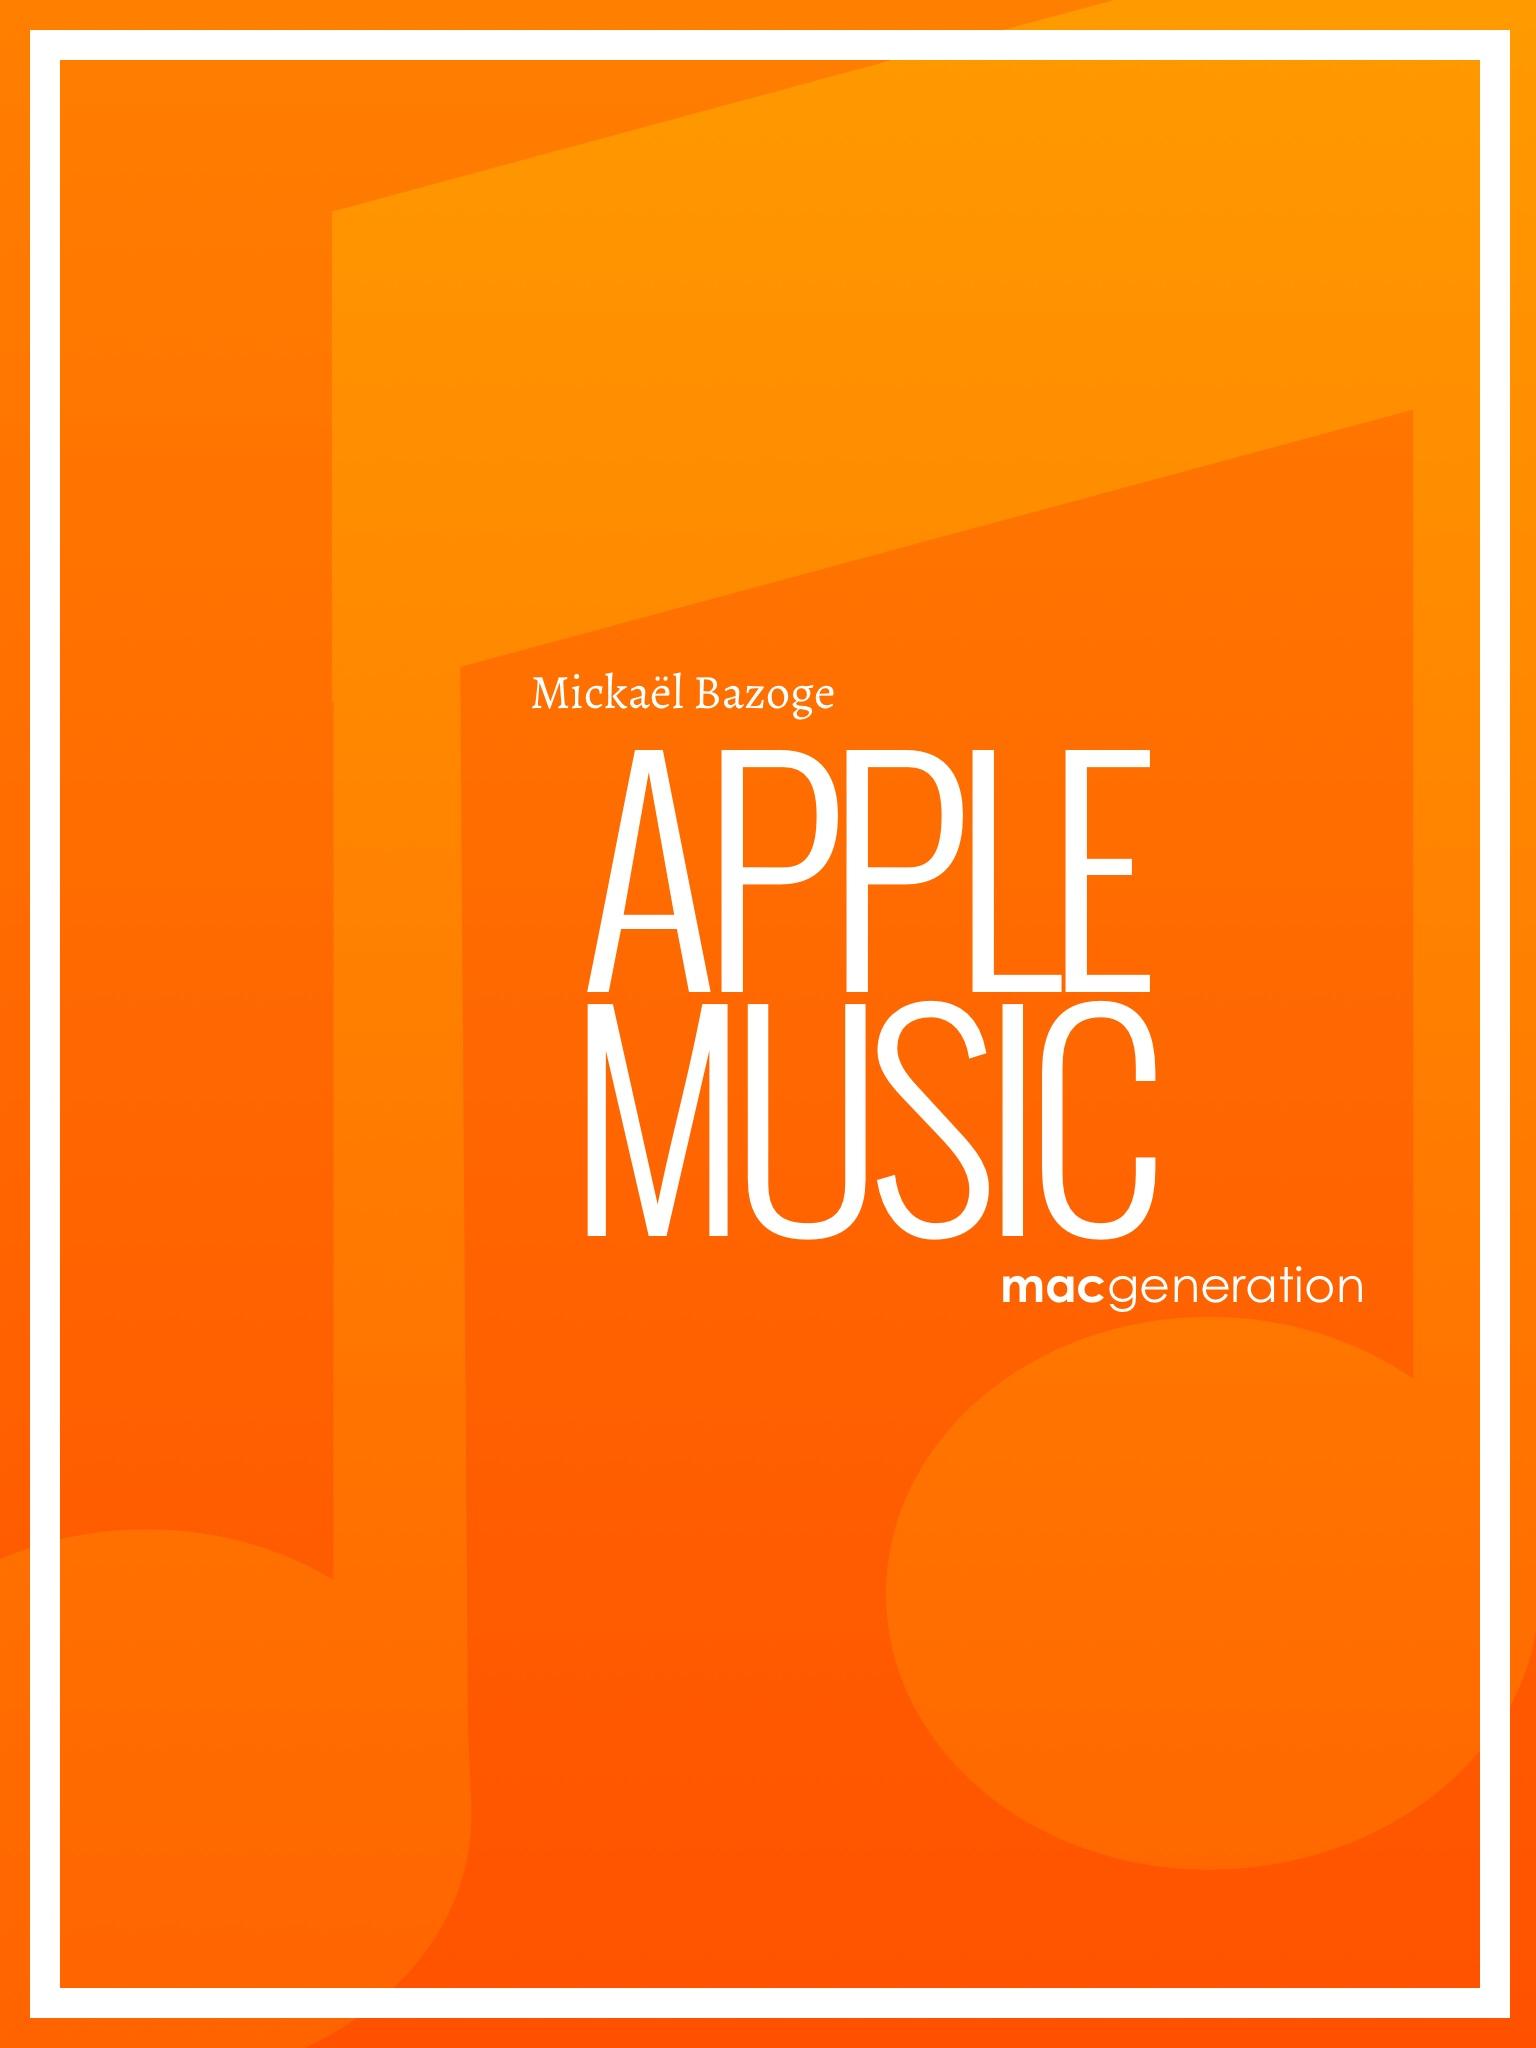 livres/savoir-music.jpg